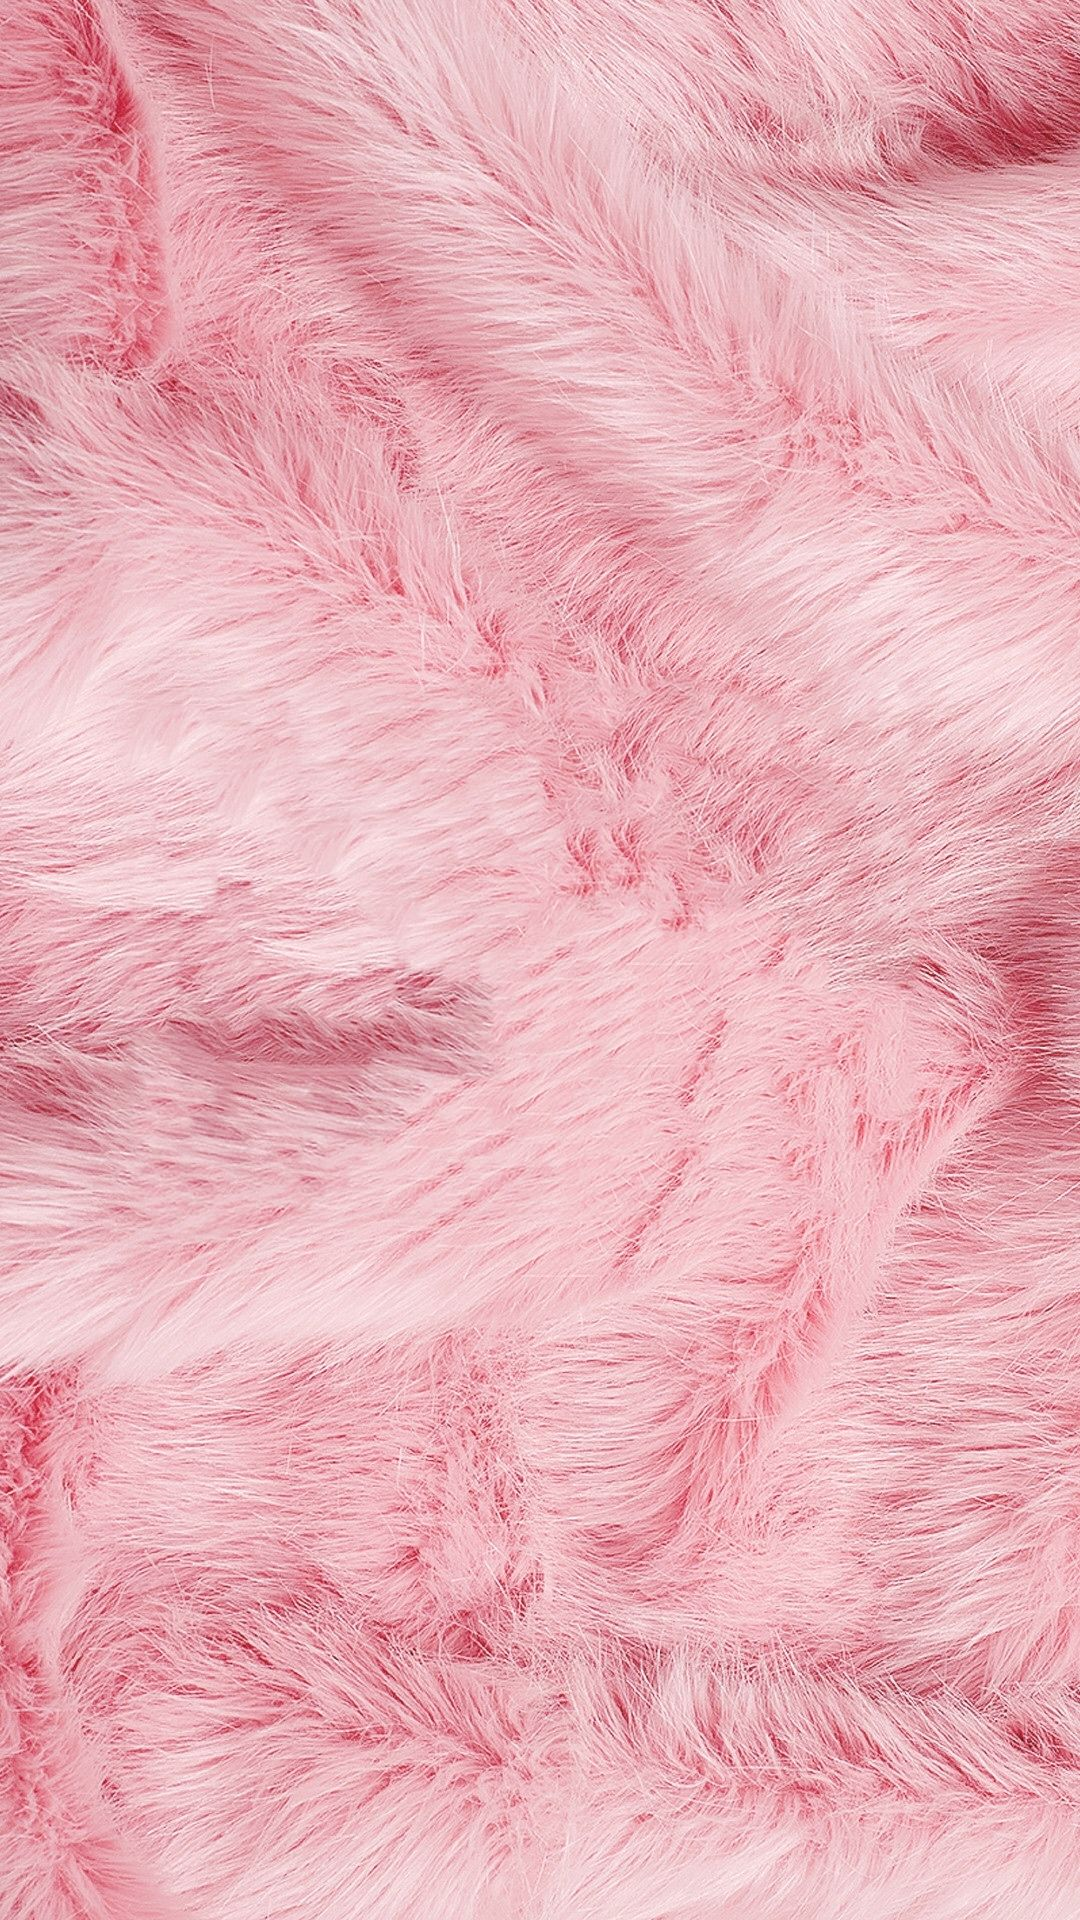 Pink Fur Texture IPhone Wallpaper